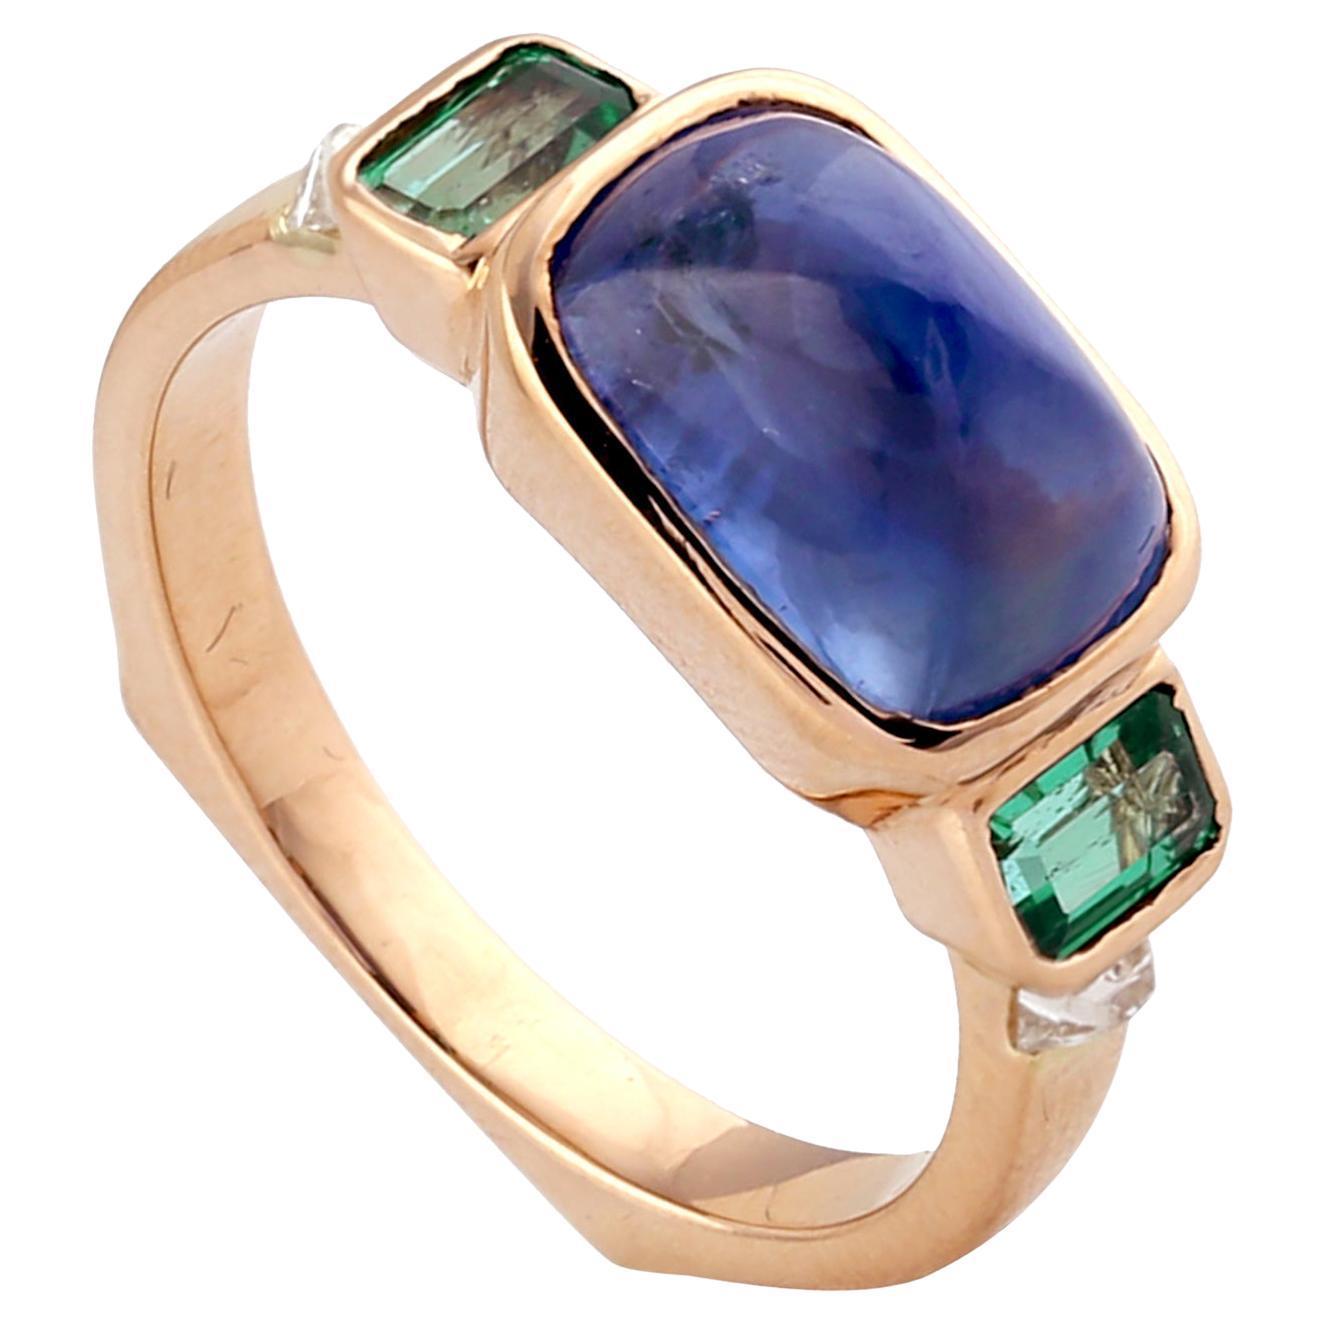 Designer Sugarloaf Cut Sapphire and Baguette Emerald Ring Set in 18k Gold